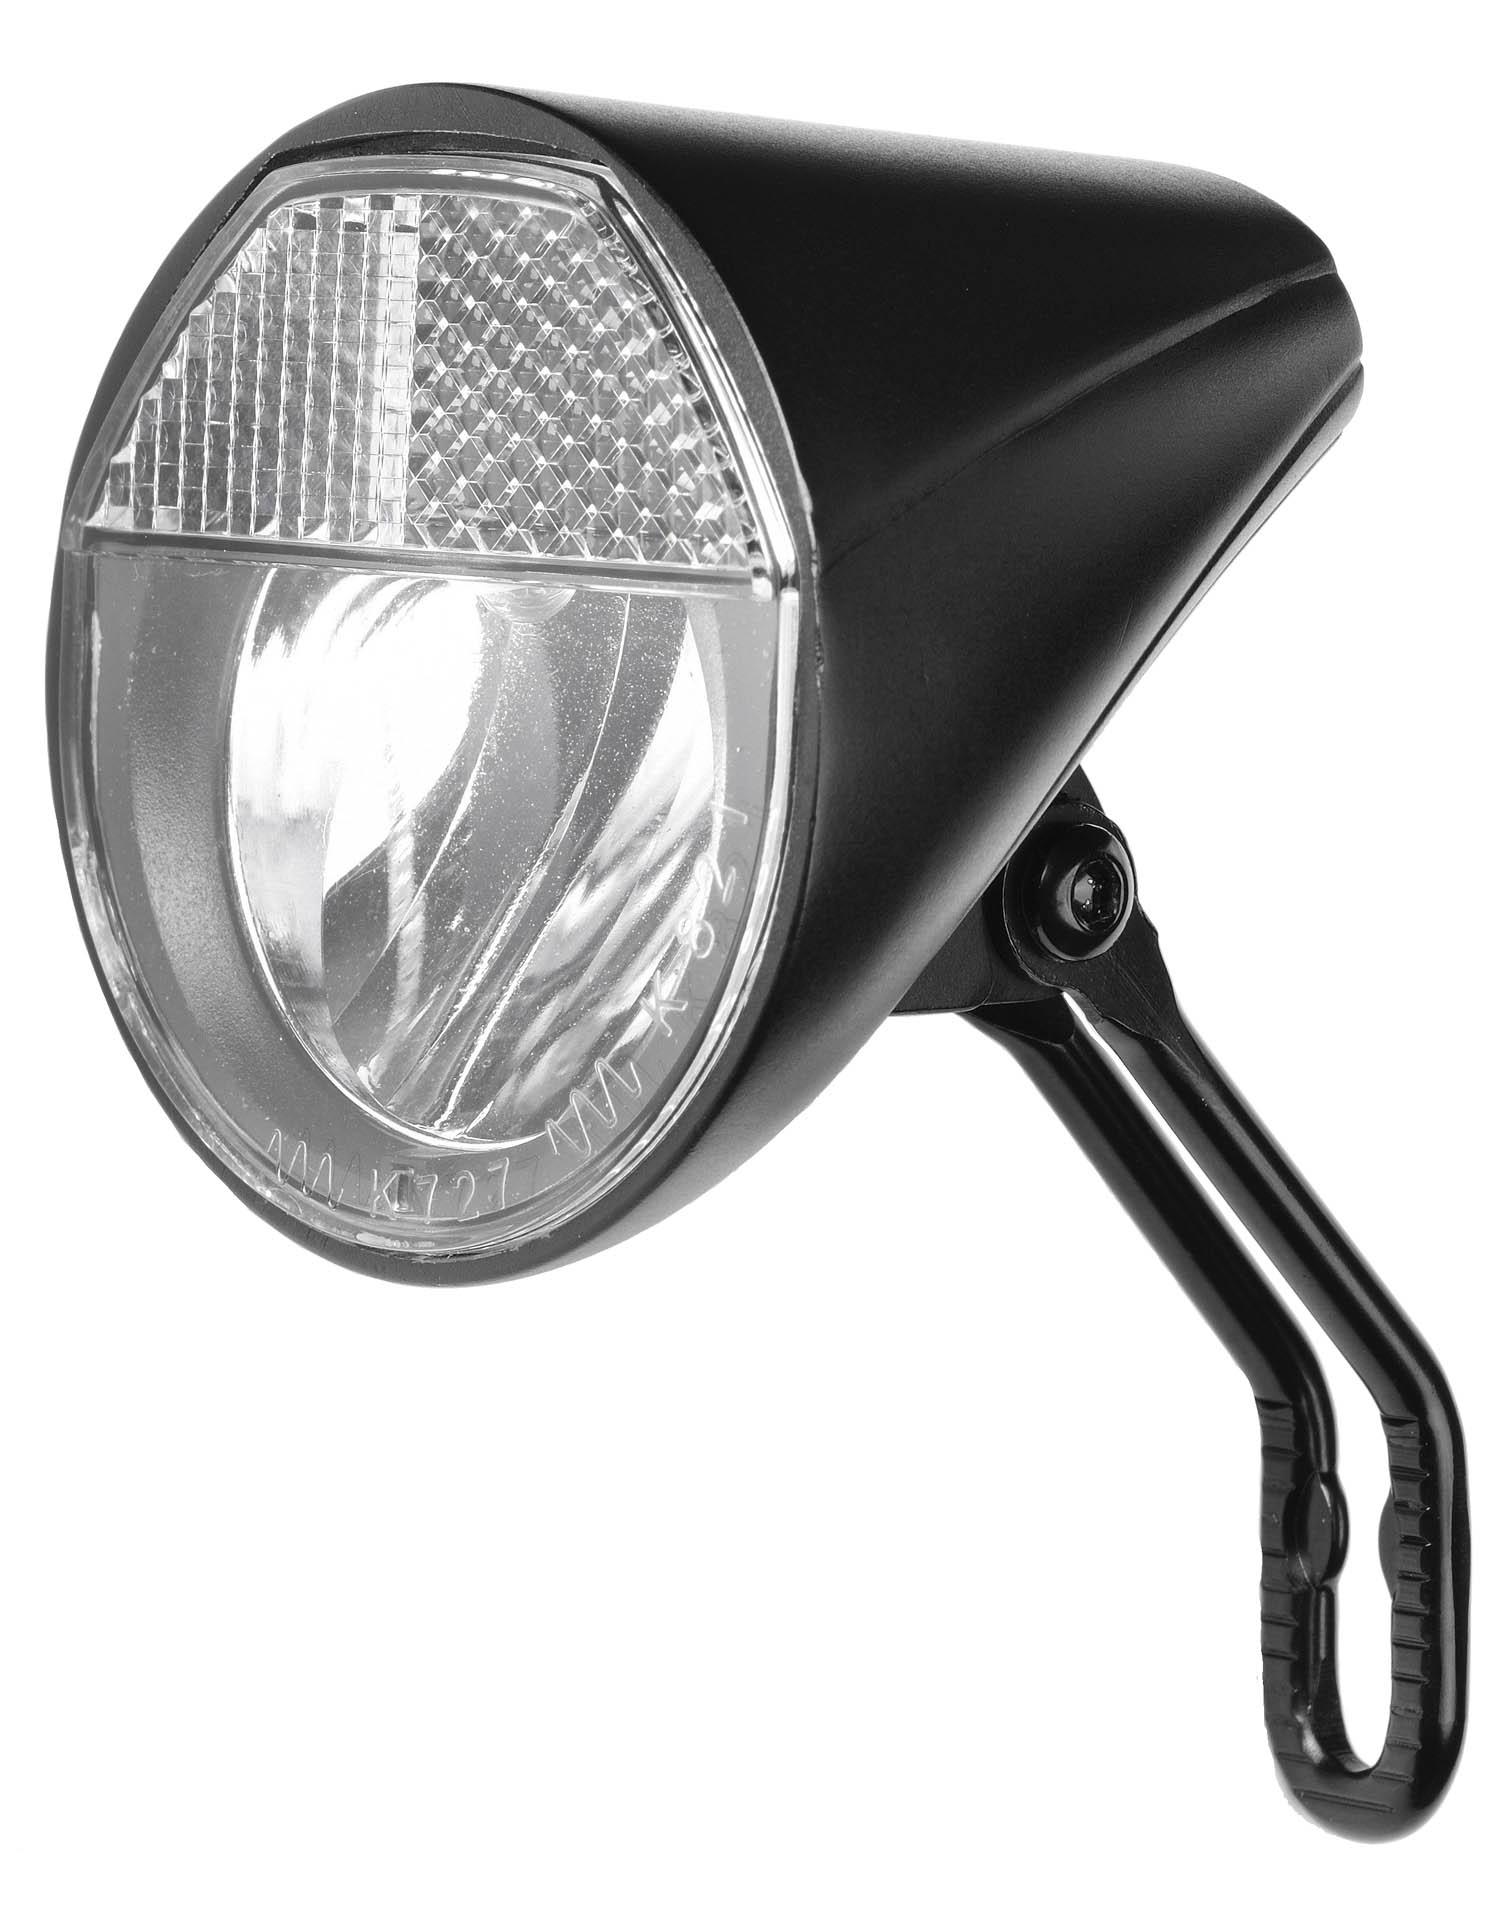 fuxon f15 led beleuchtung nabendynamo scheinwerfer fahrrad lampe licht pegasus ebay. Black Bedroom Furniture Sets. Home Design Ideas